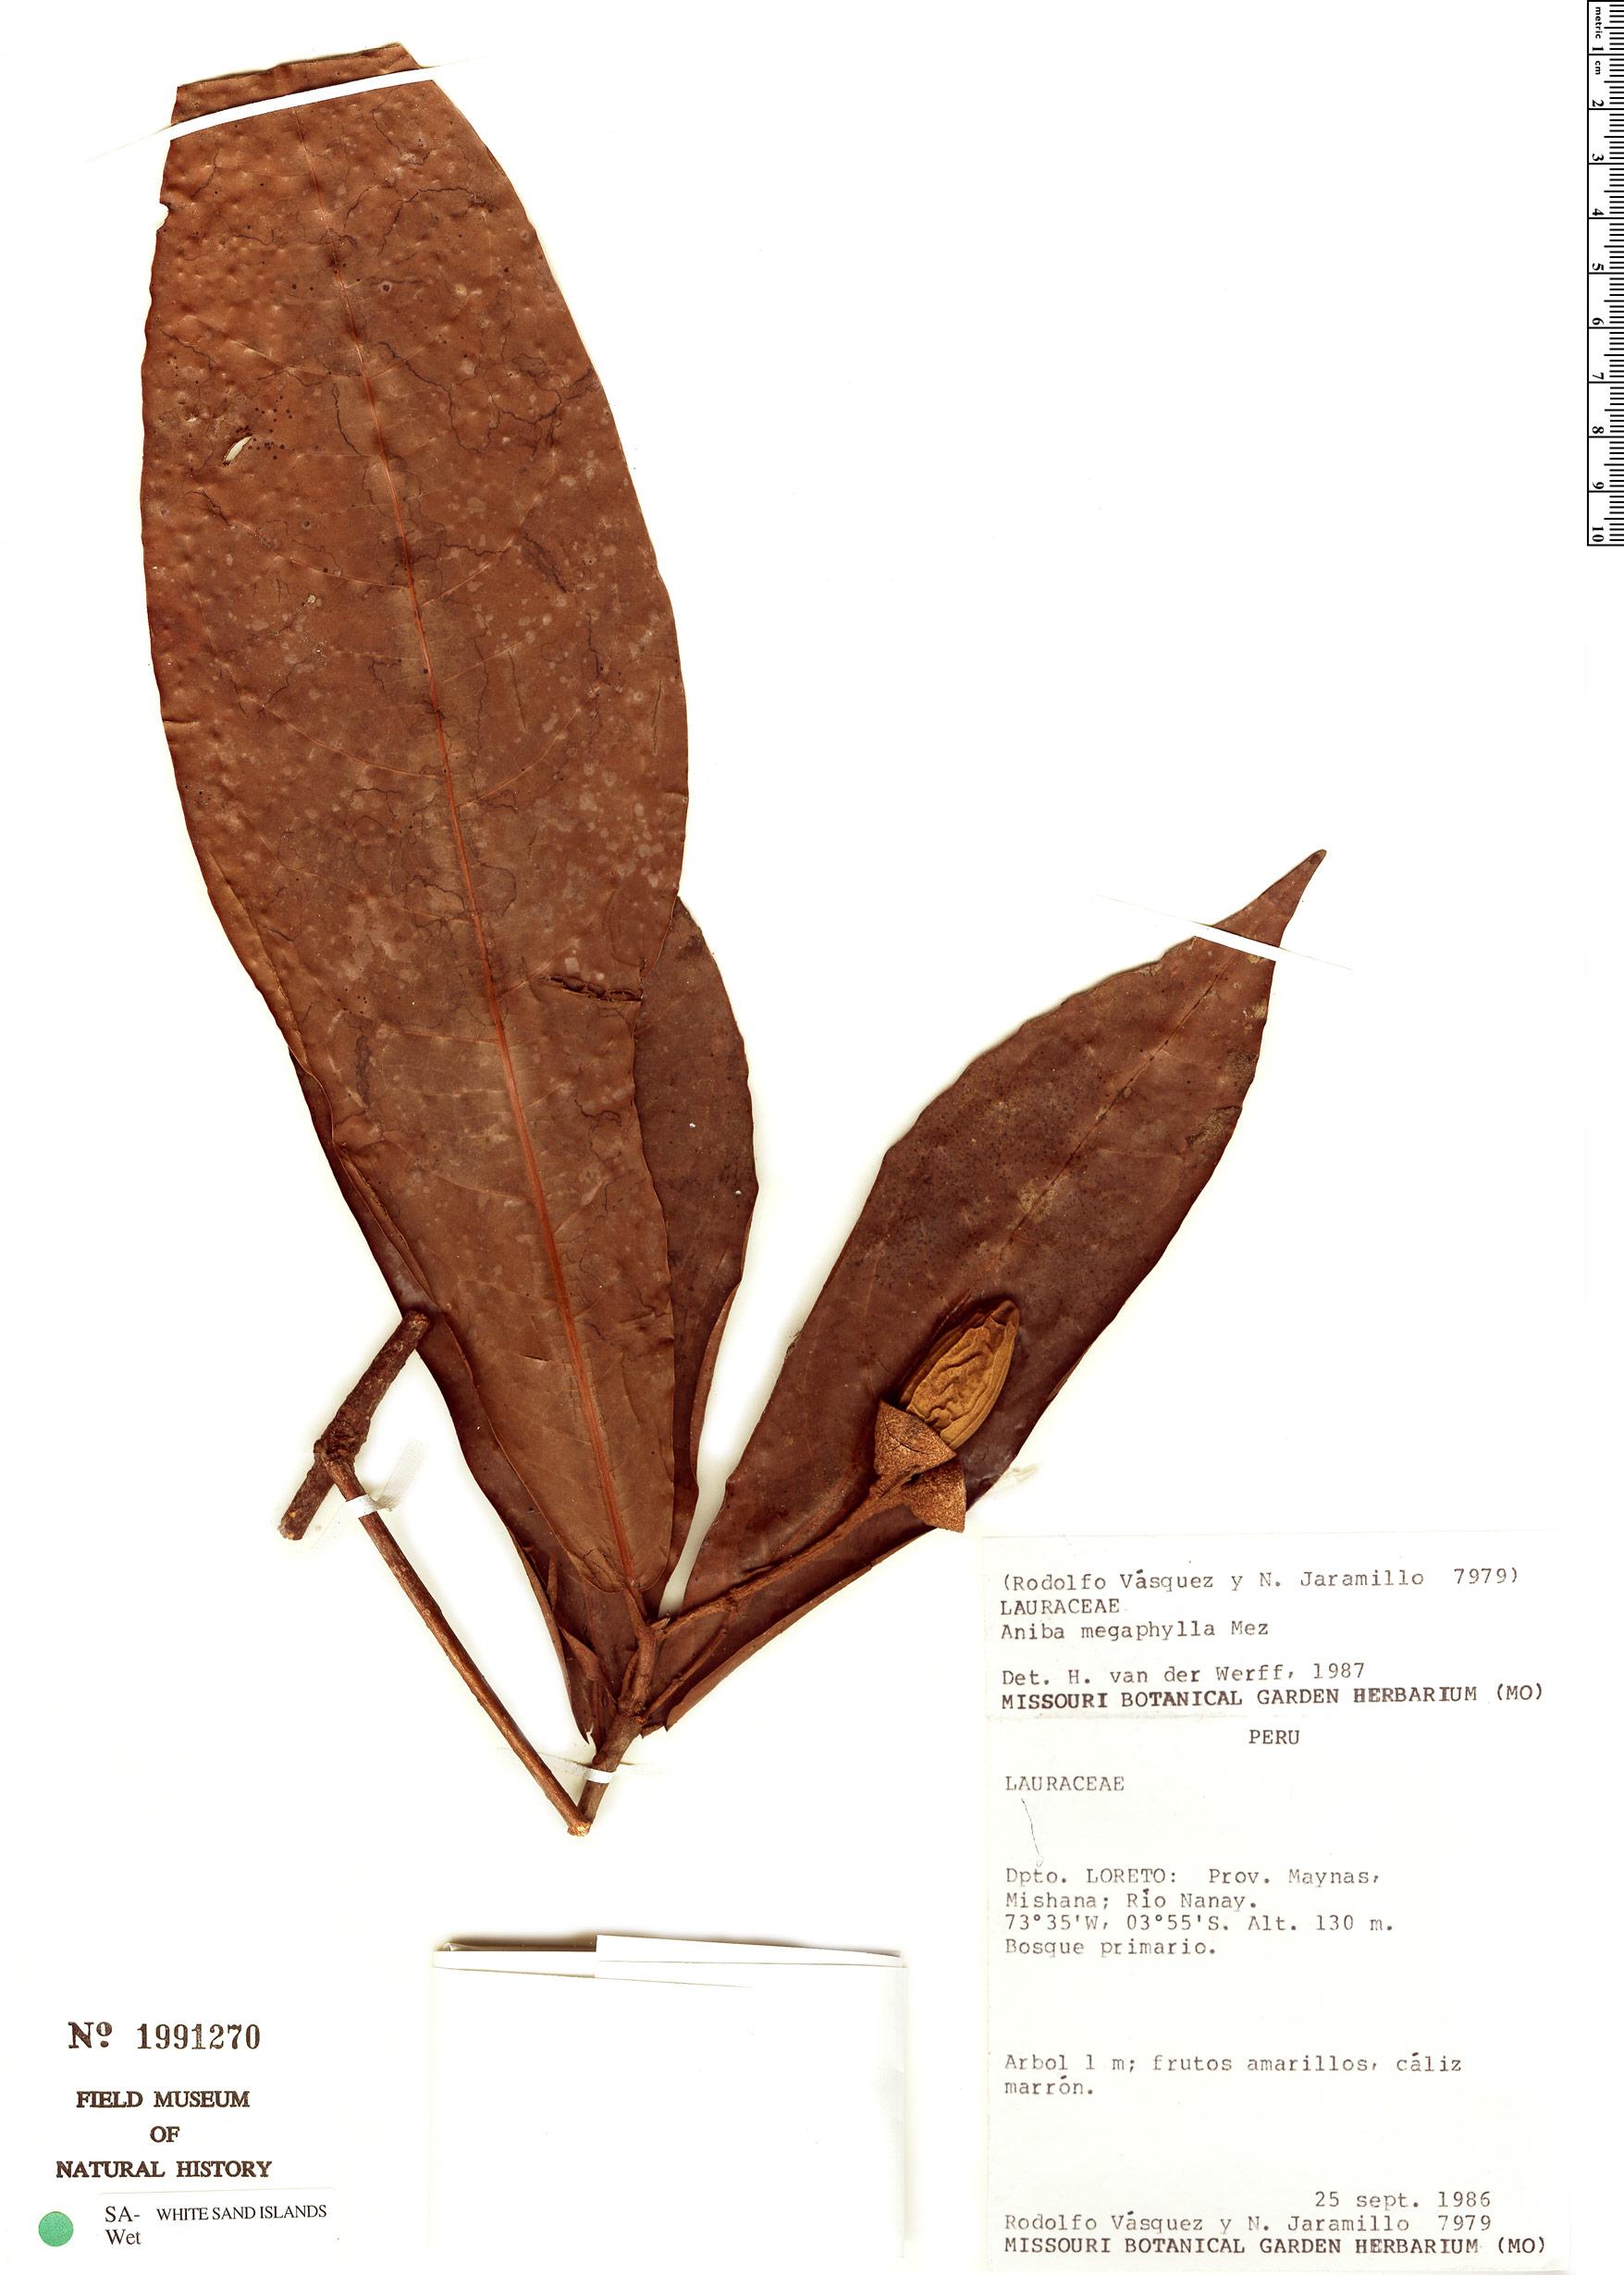 Specimen: Aniba megaphylla